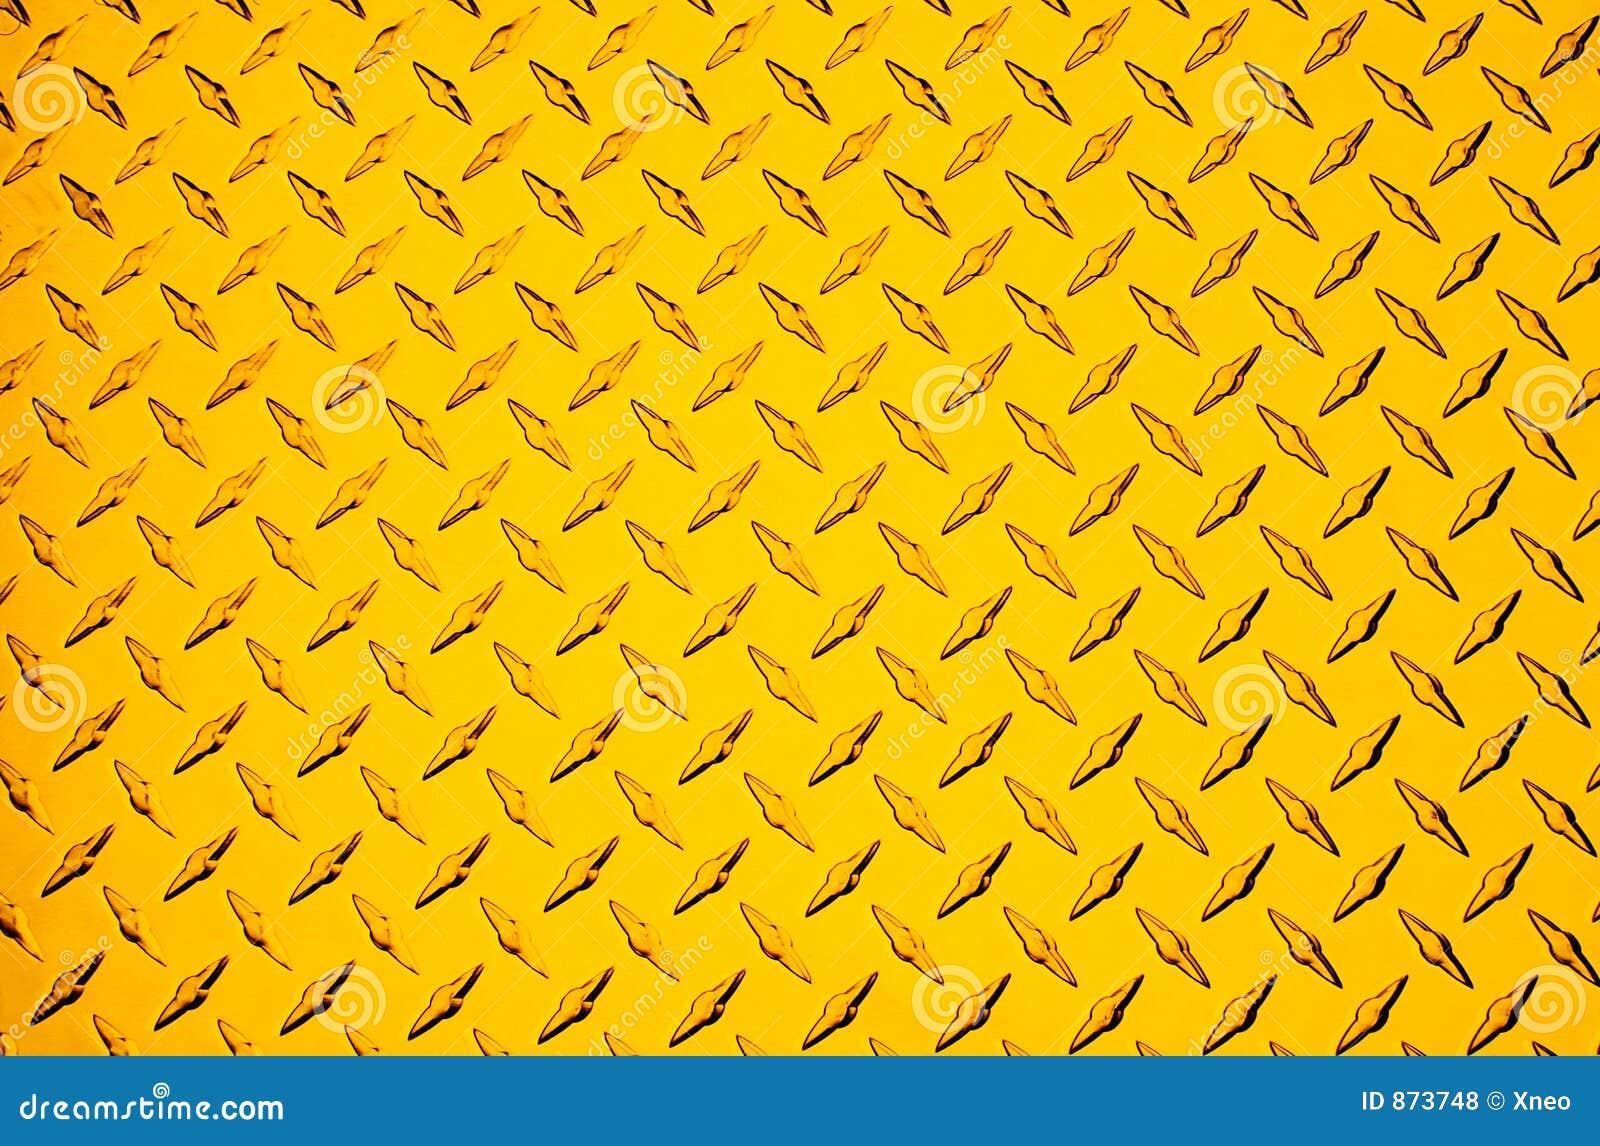 diamond plate metallic border - photo #48